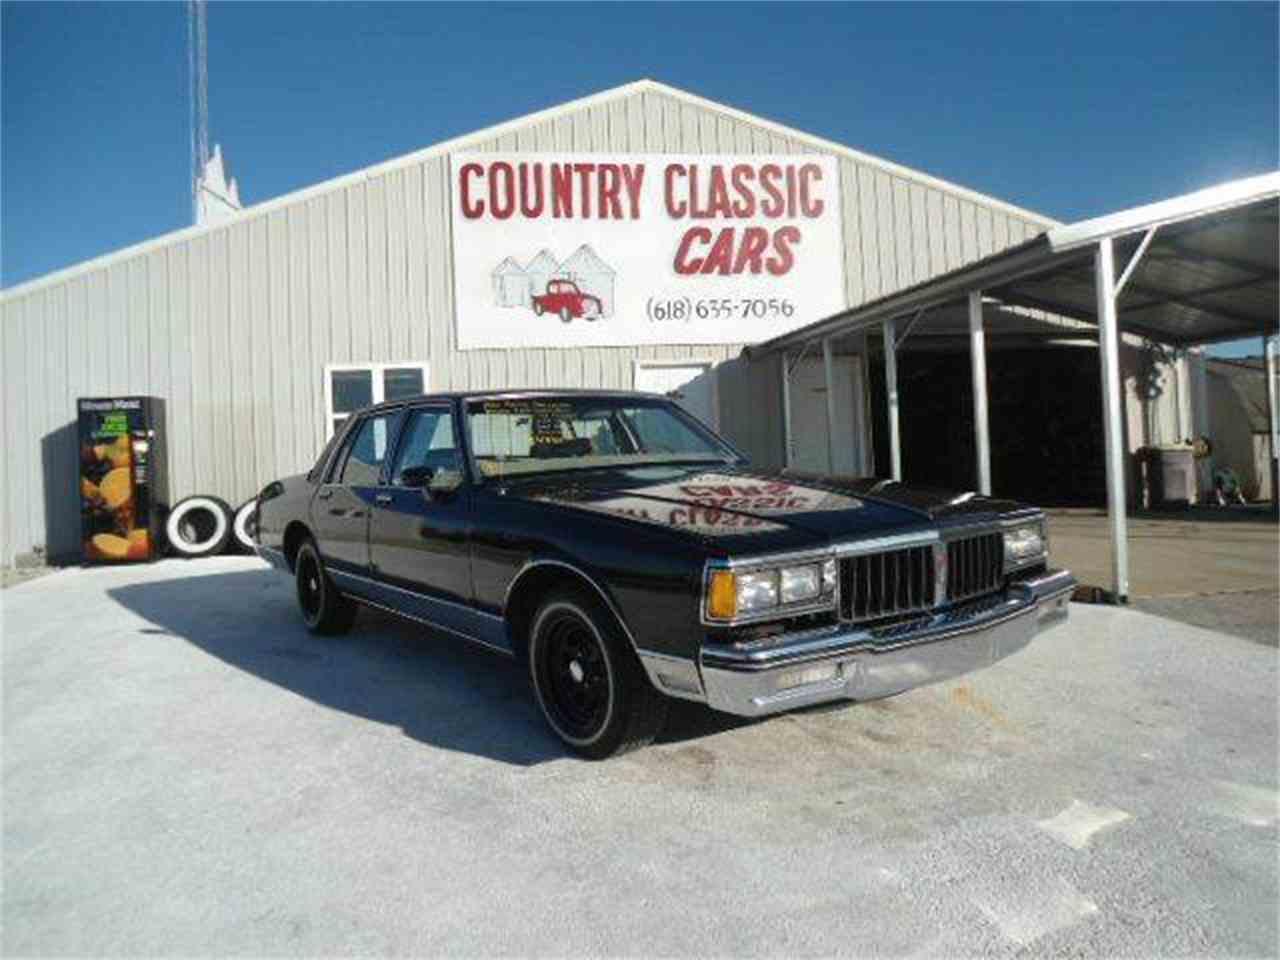 Large Picture of 1986 Pontiac Parisienne located in Staunton Illinois - $4,950.00 - K46K